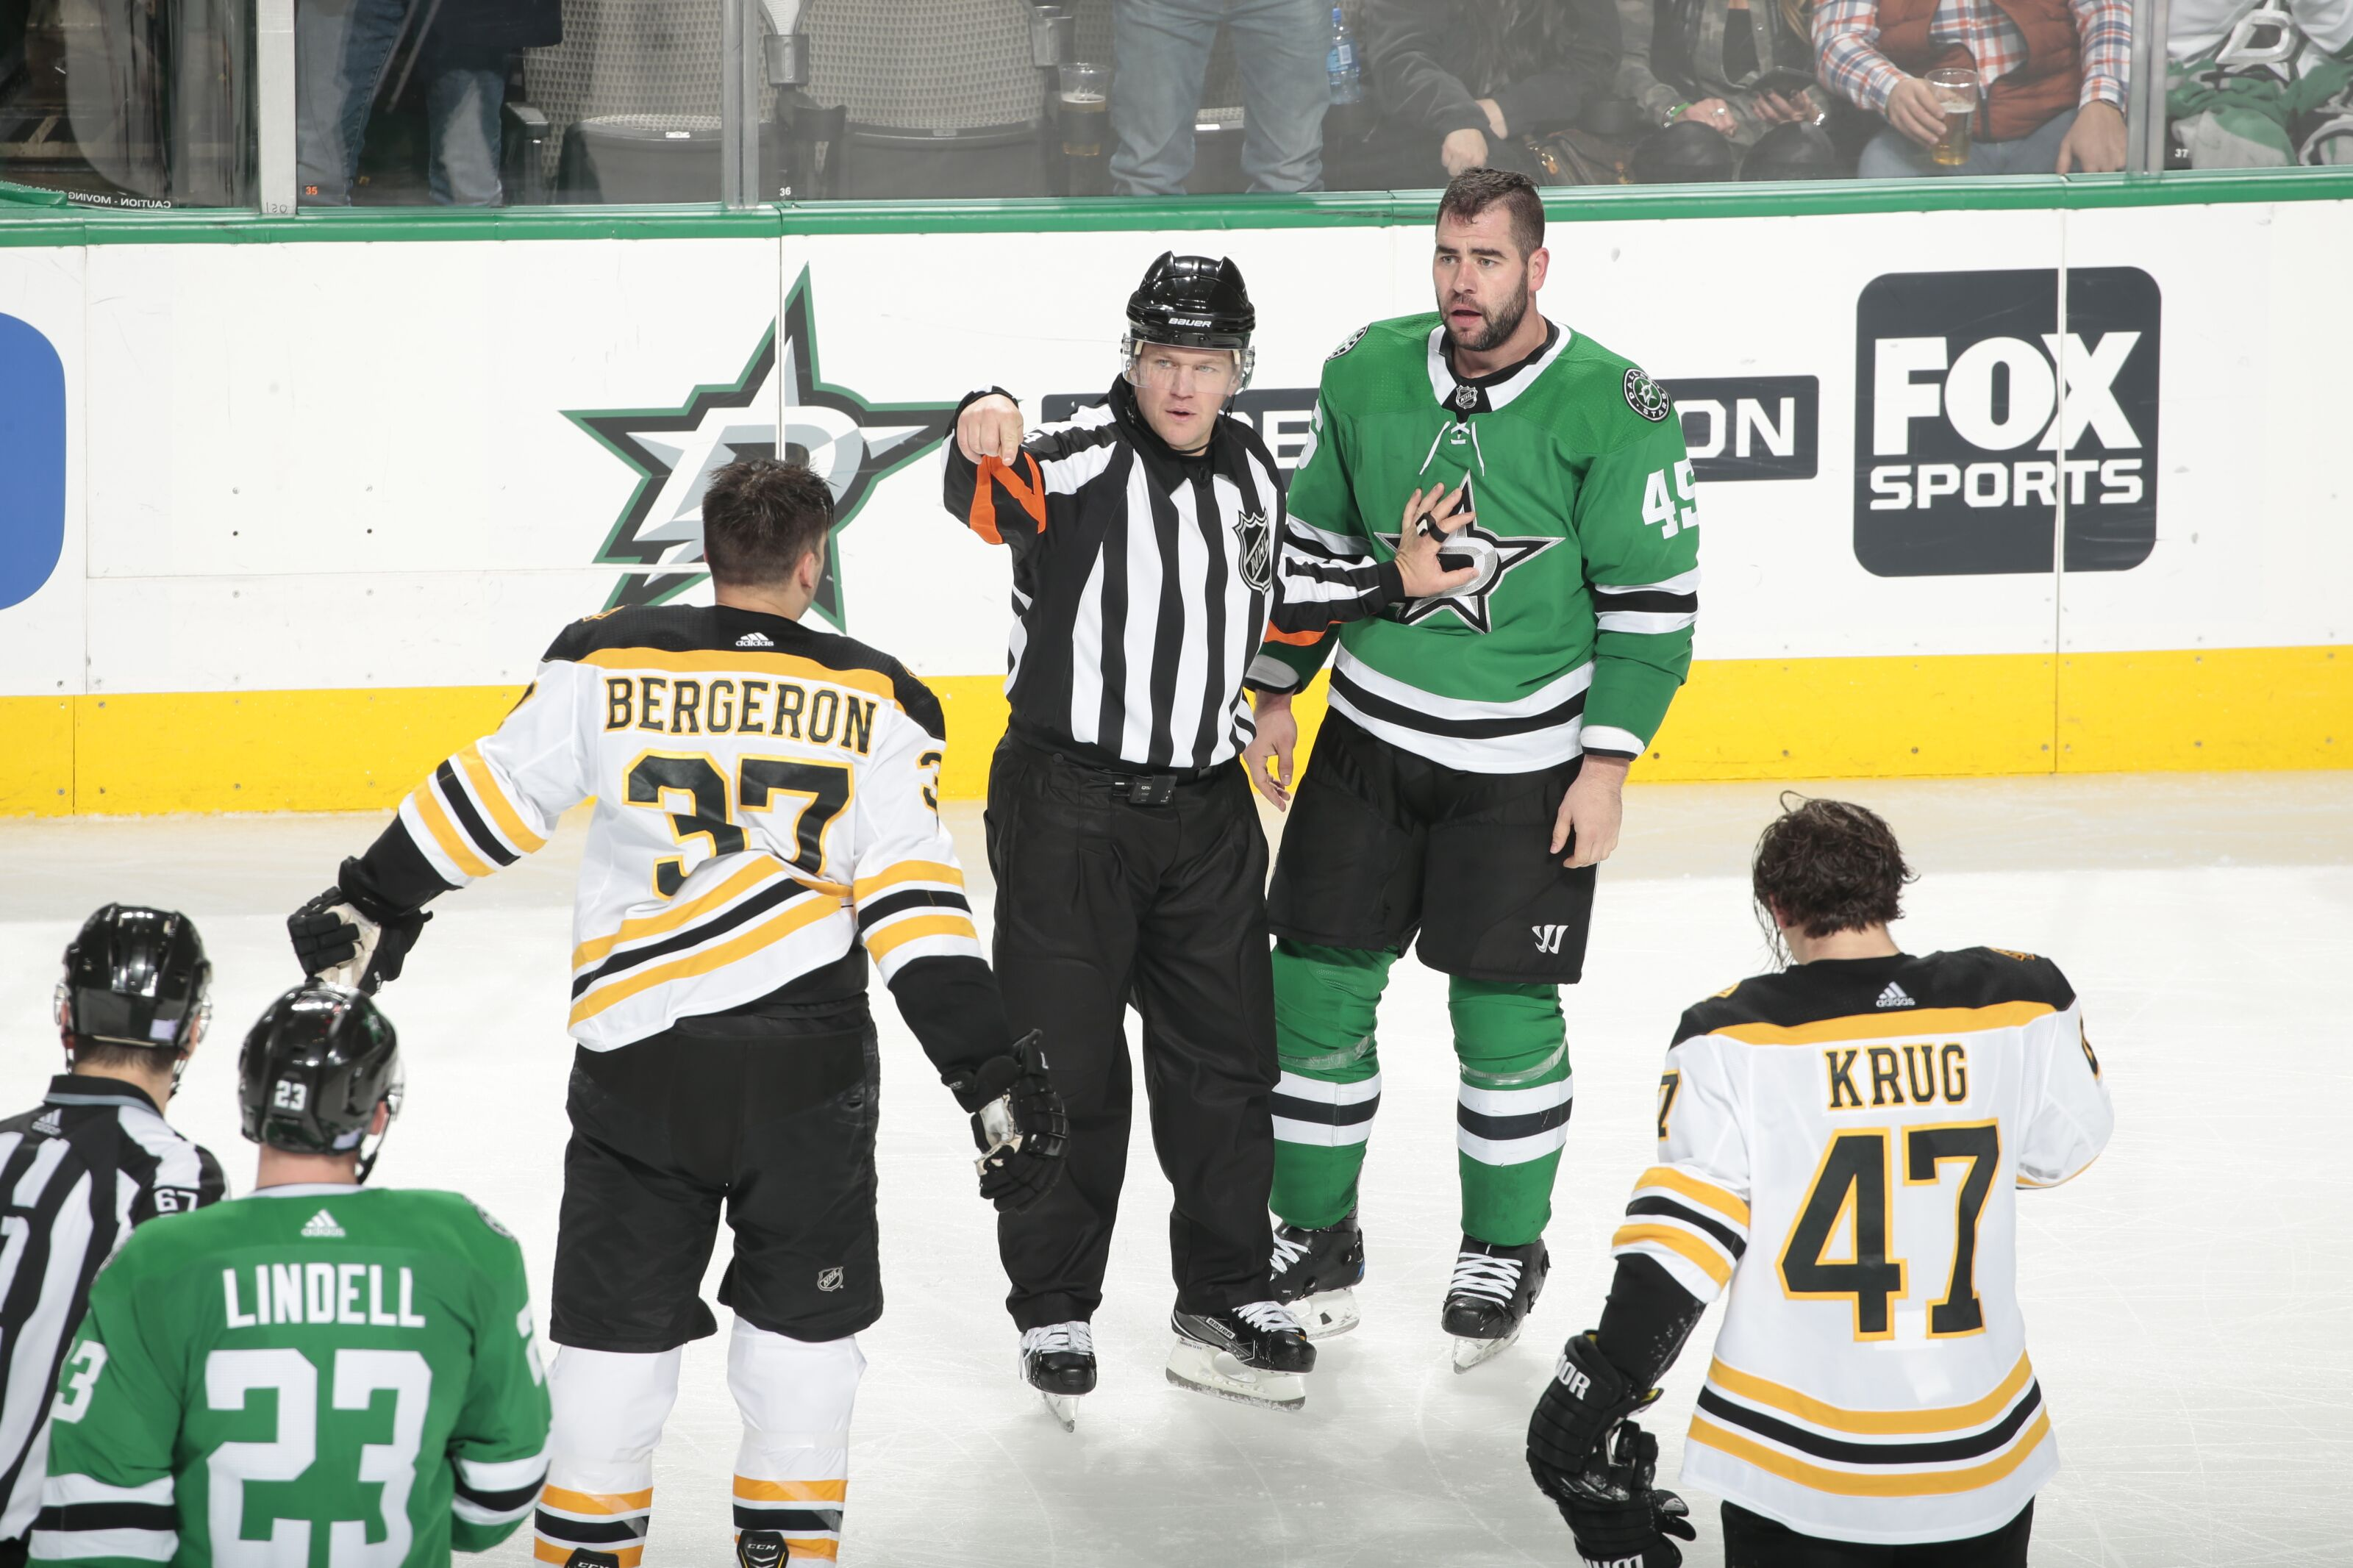 Dallas Stars News: Stars Opening 2019-20 Season Against Boston Bruins